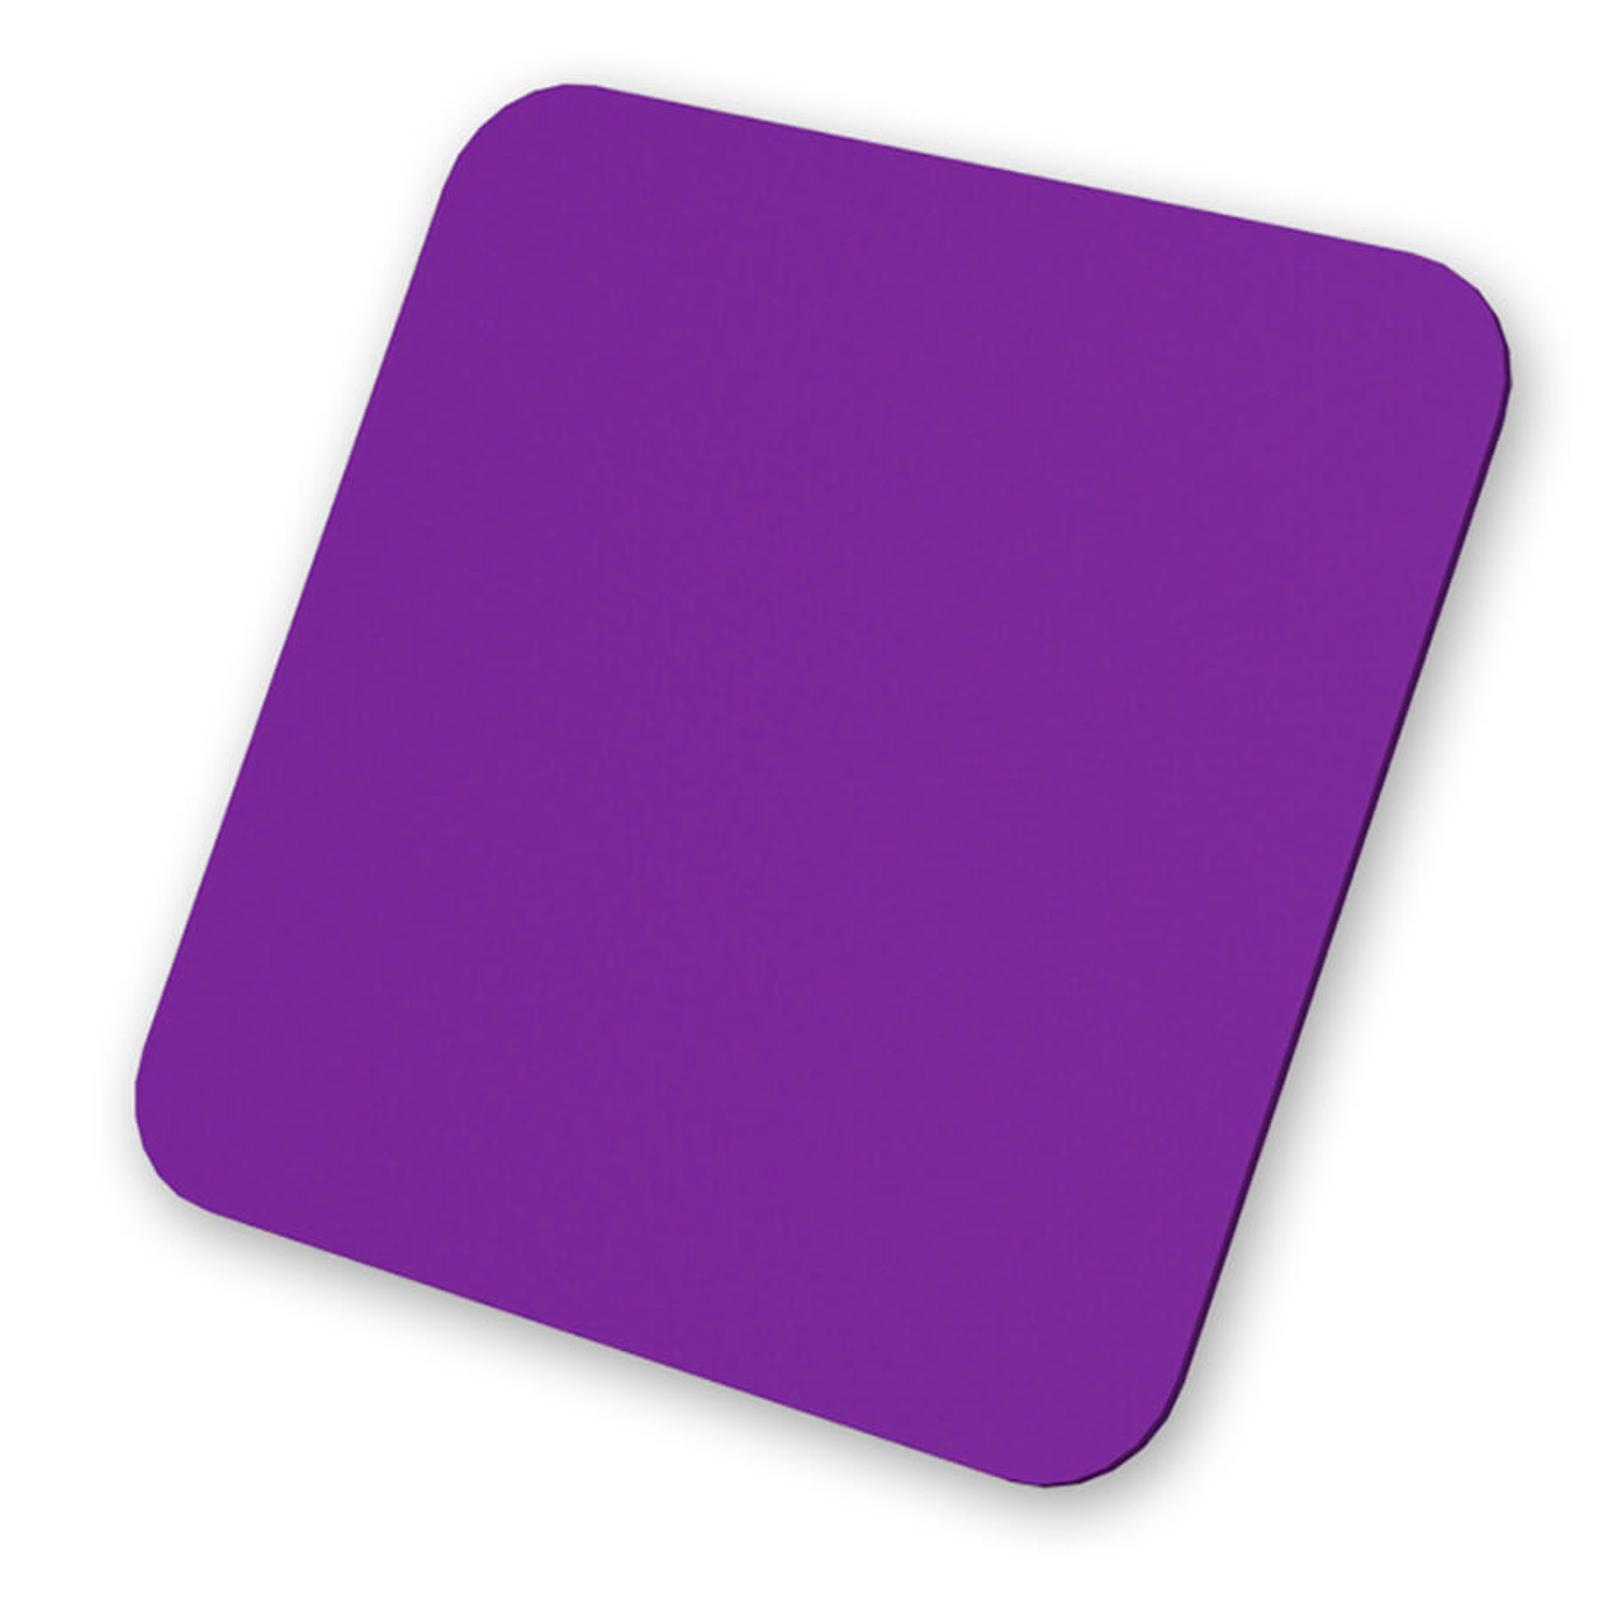 Istuintyyny Cube-koristevalaisimeen, violetti